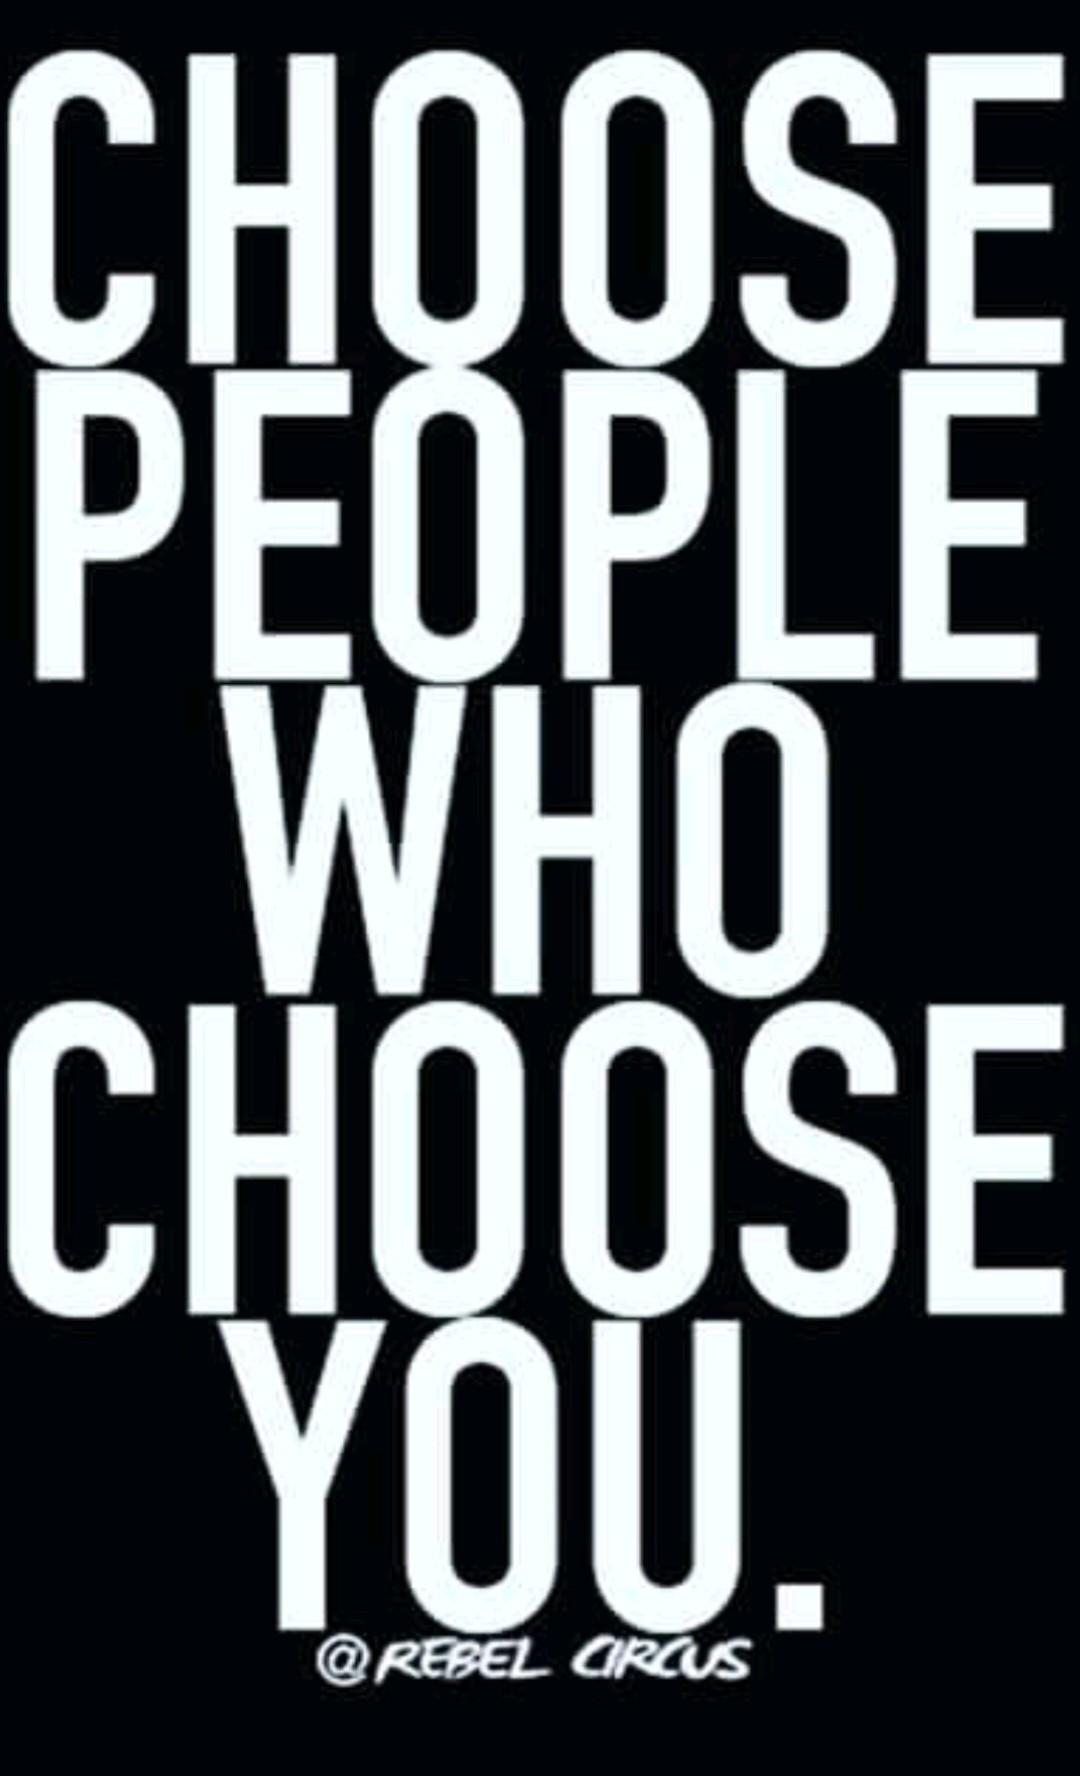 Choose People Who Choose You